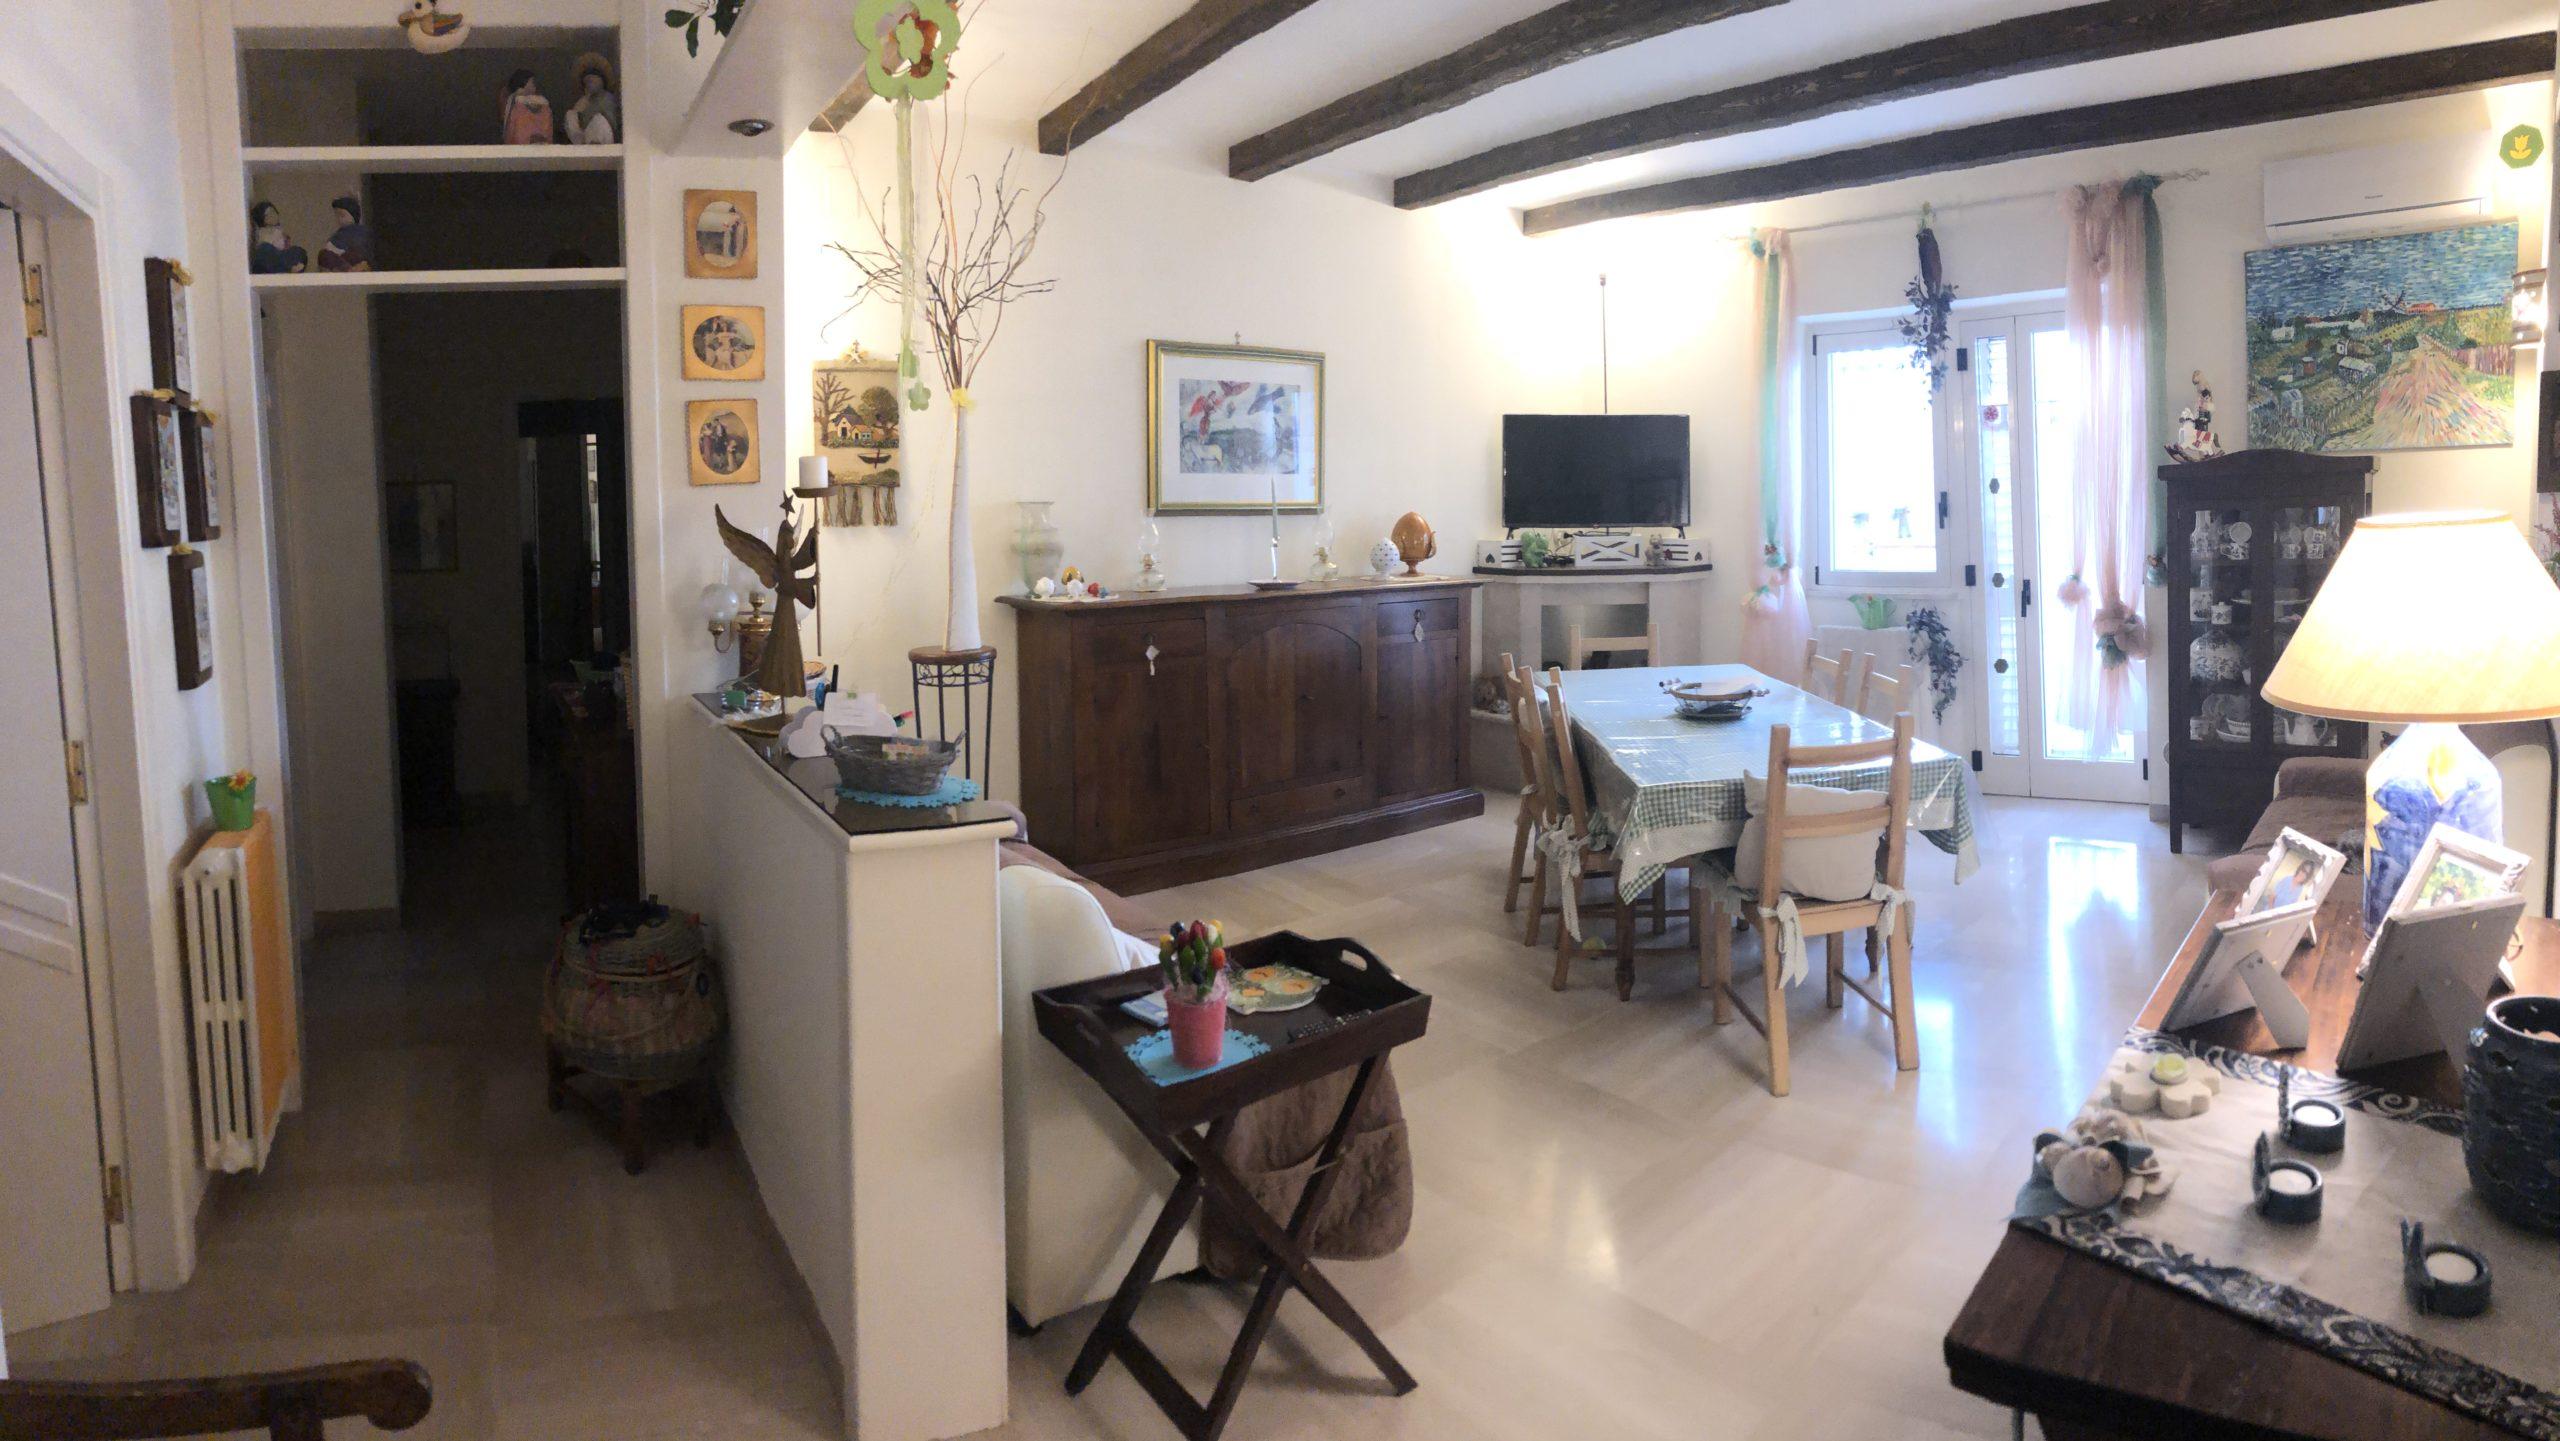 Camera Matrimoniale A Grottaglie.Via Morandi 31 P2 Grottaglie Guido Immobiliare